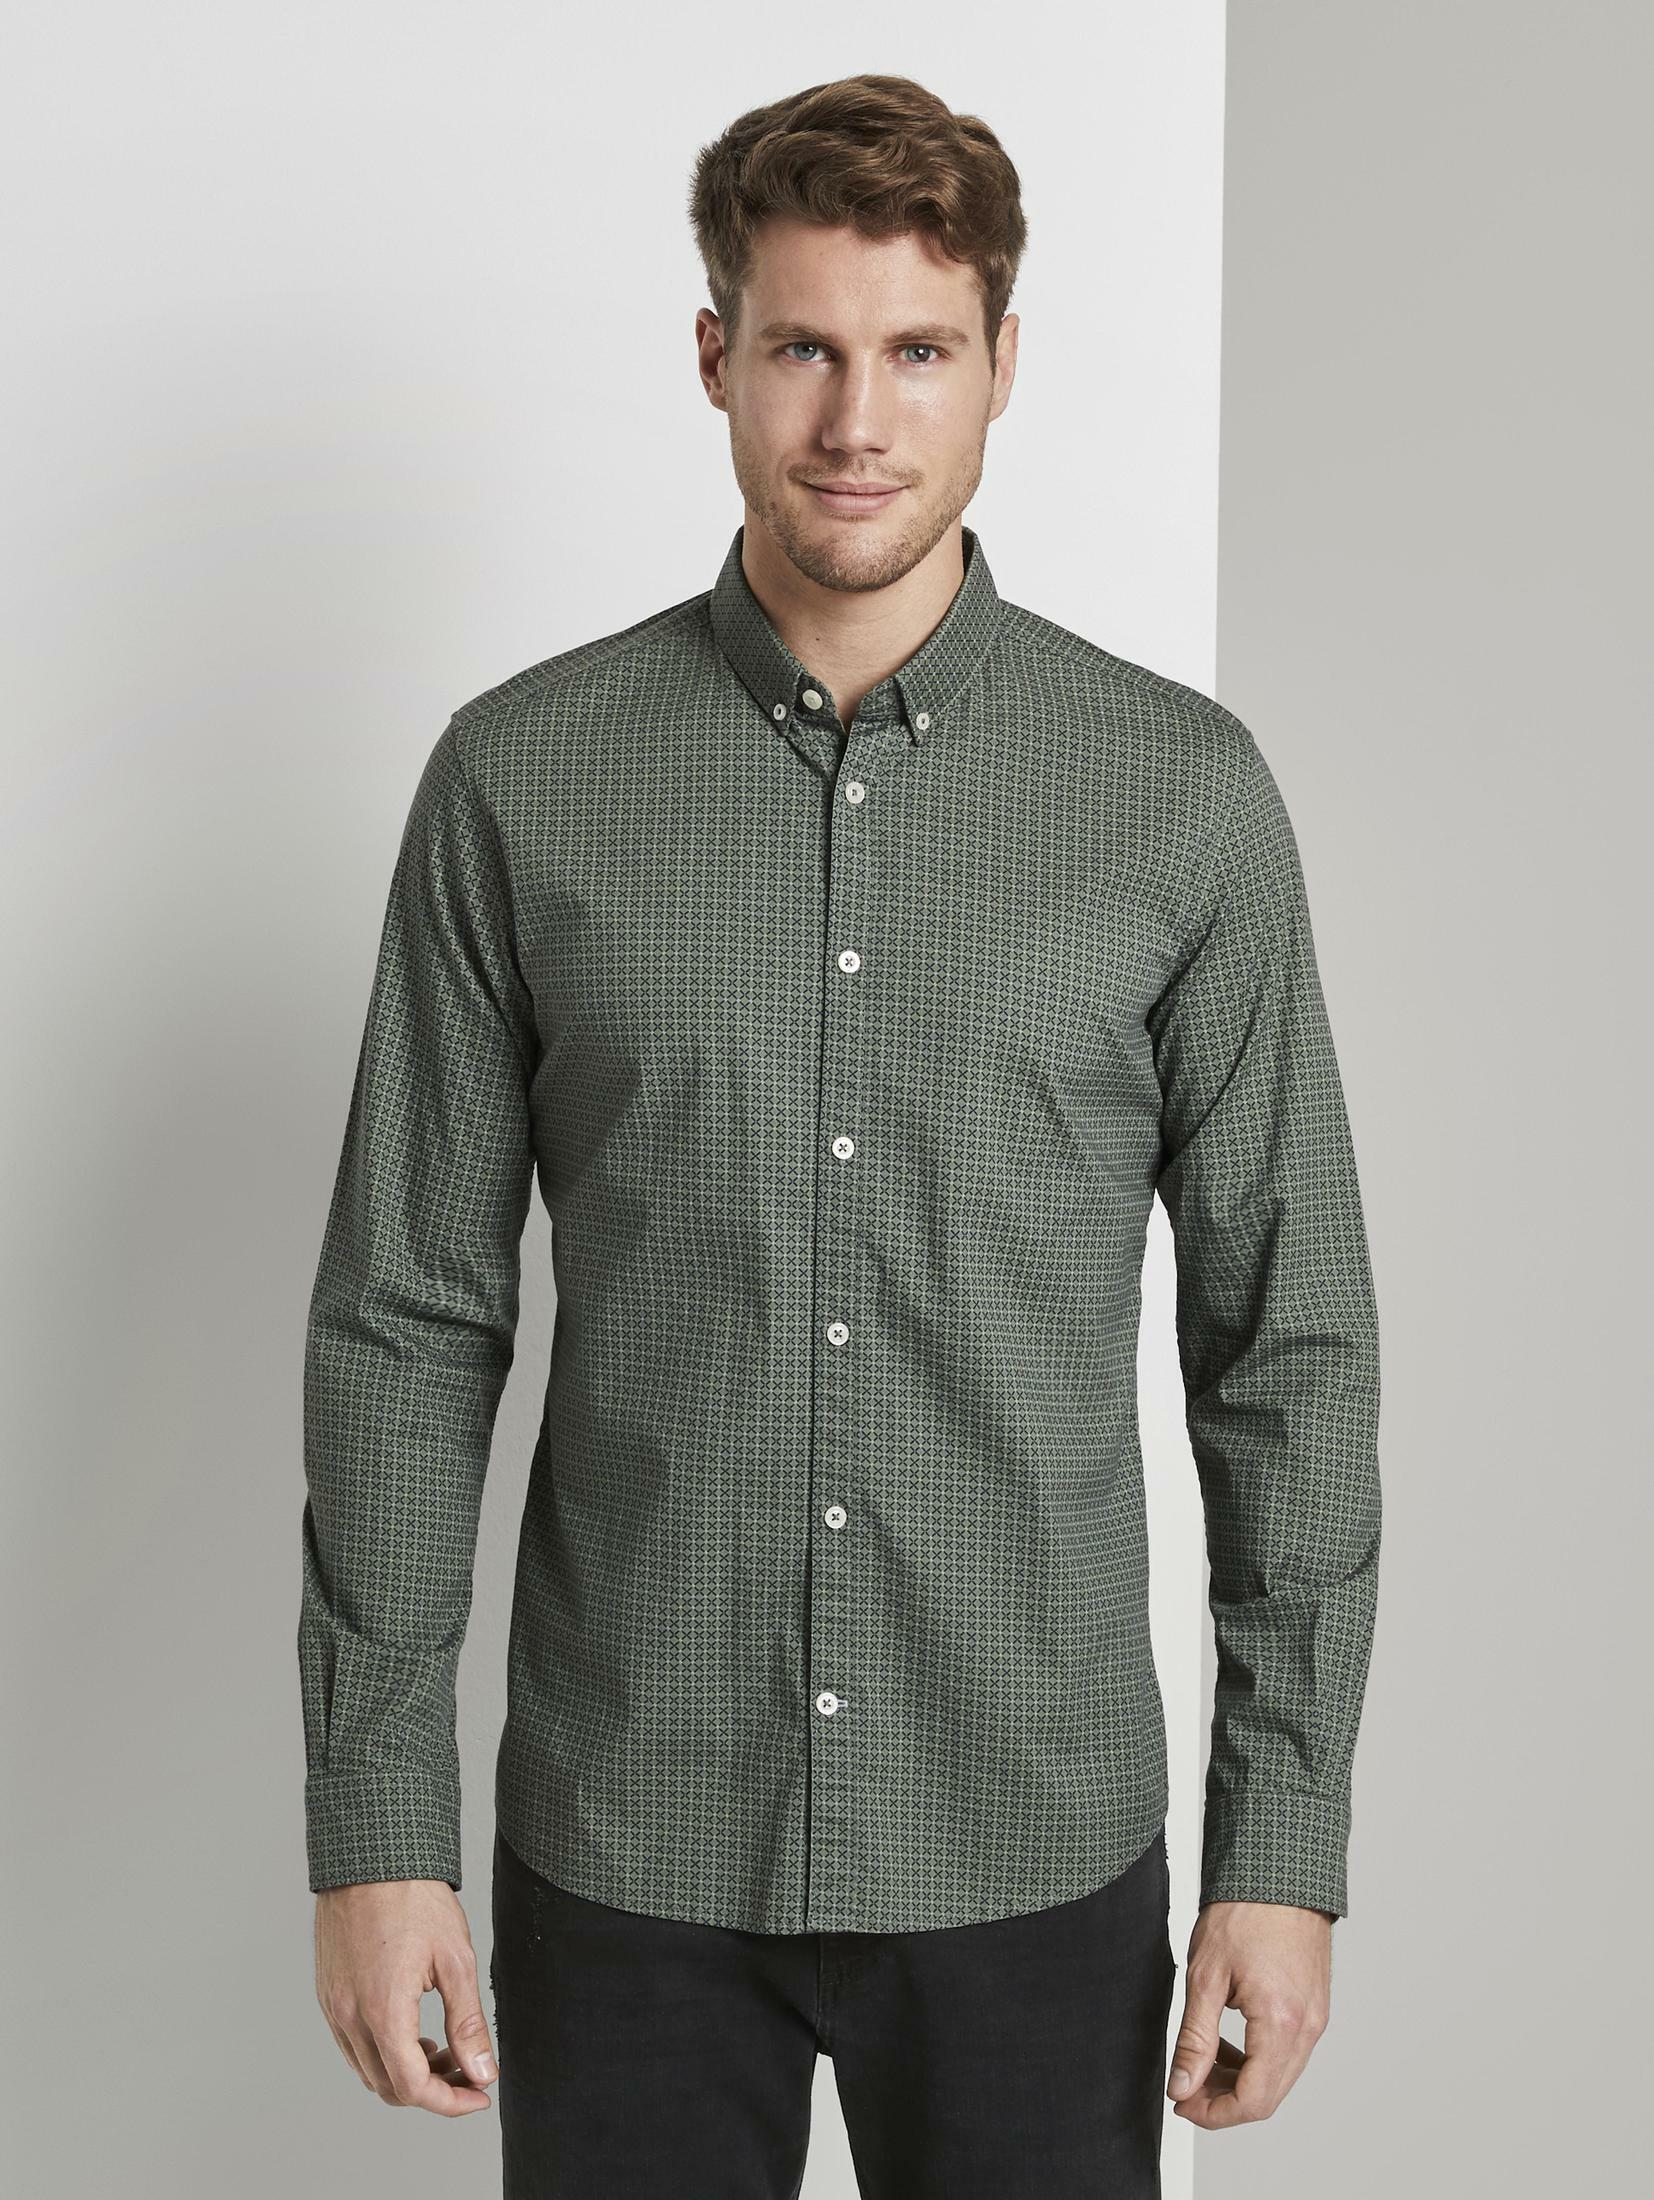 TOM TAILOR Outdoorhemd Gemustertes Hemd | Bekleidung > Hemden > Freizeithemden | Tom Tailor